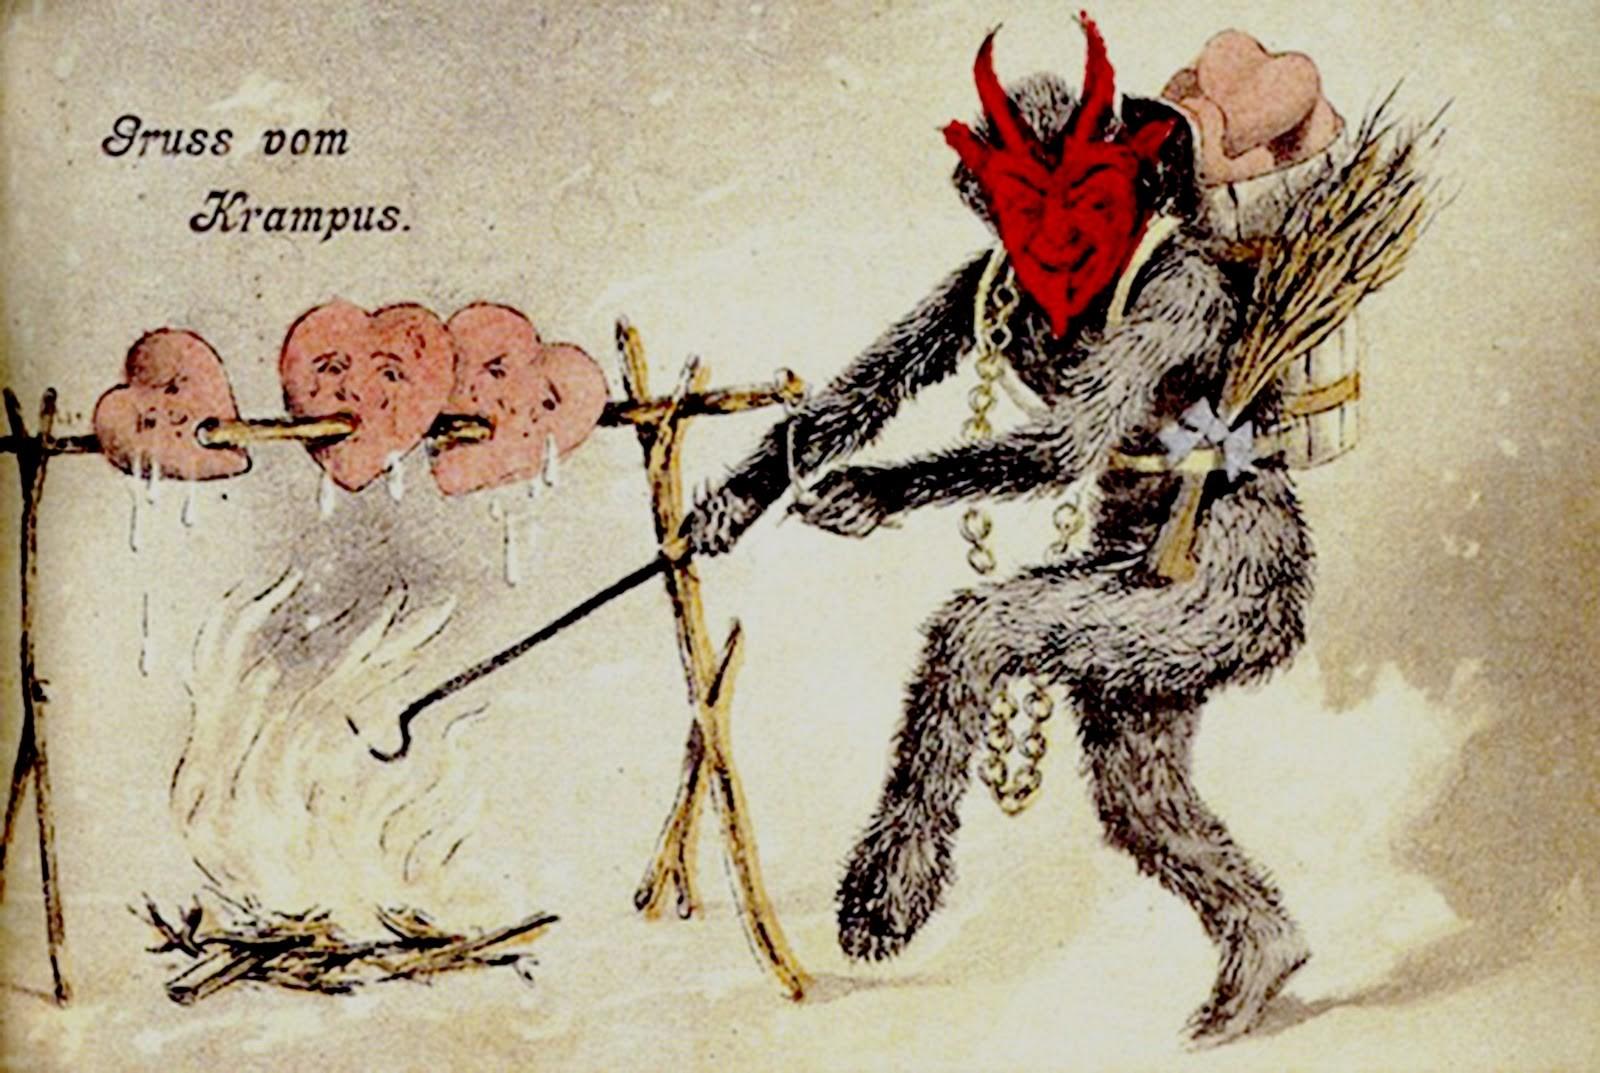 Ausmalbilder Nikolaus Krampus : Itt A Kreature Named Krampus